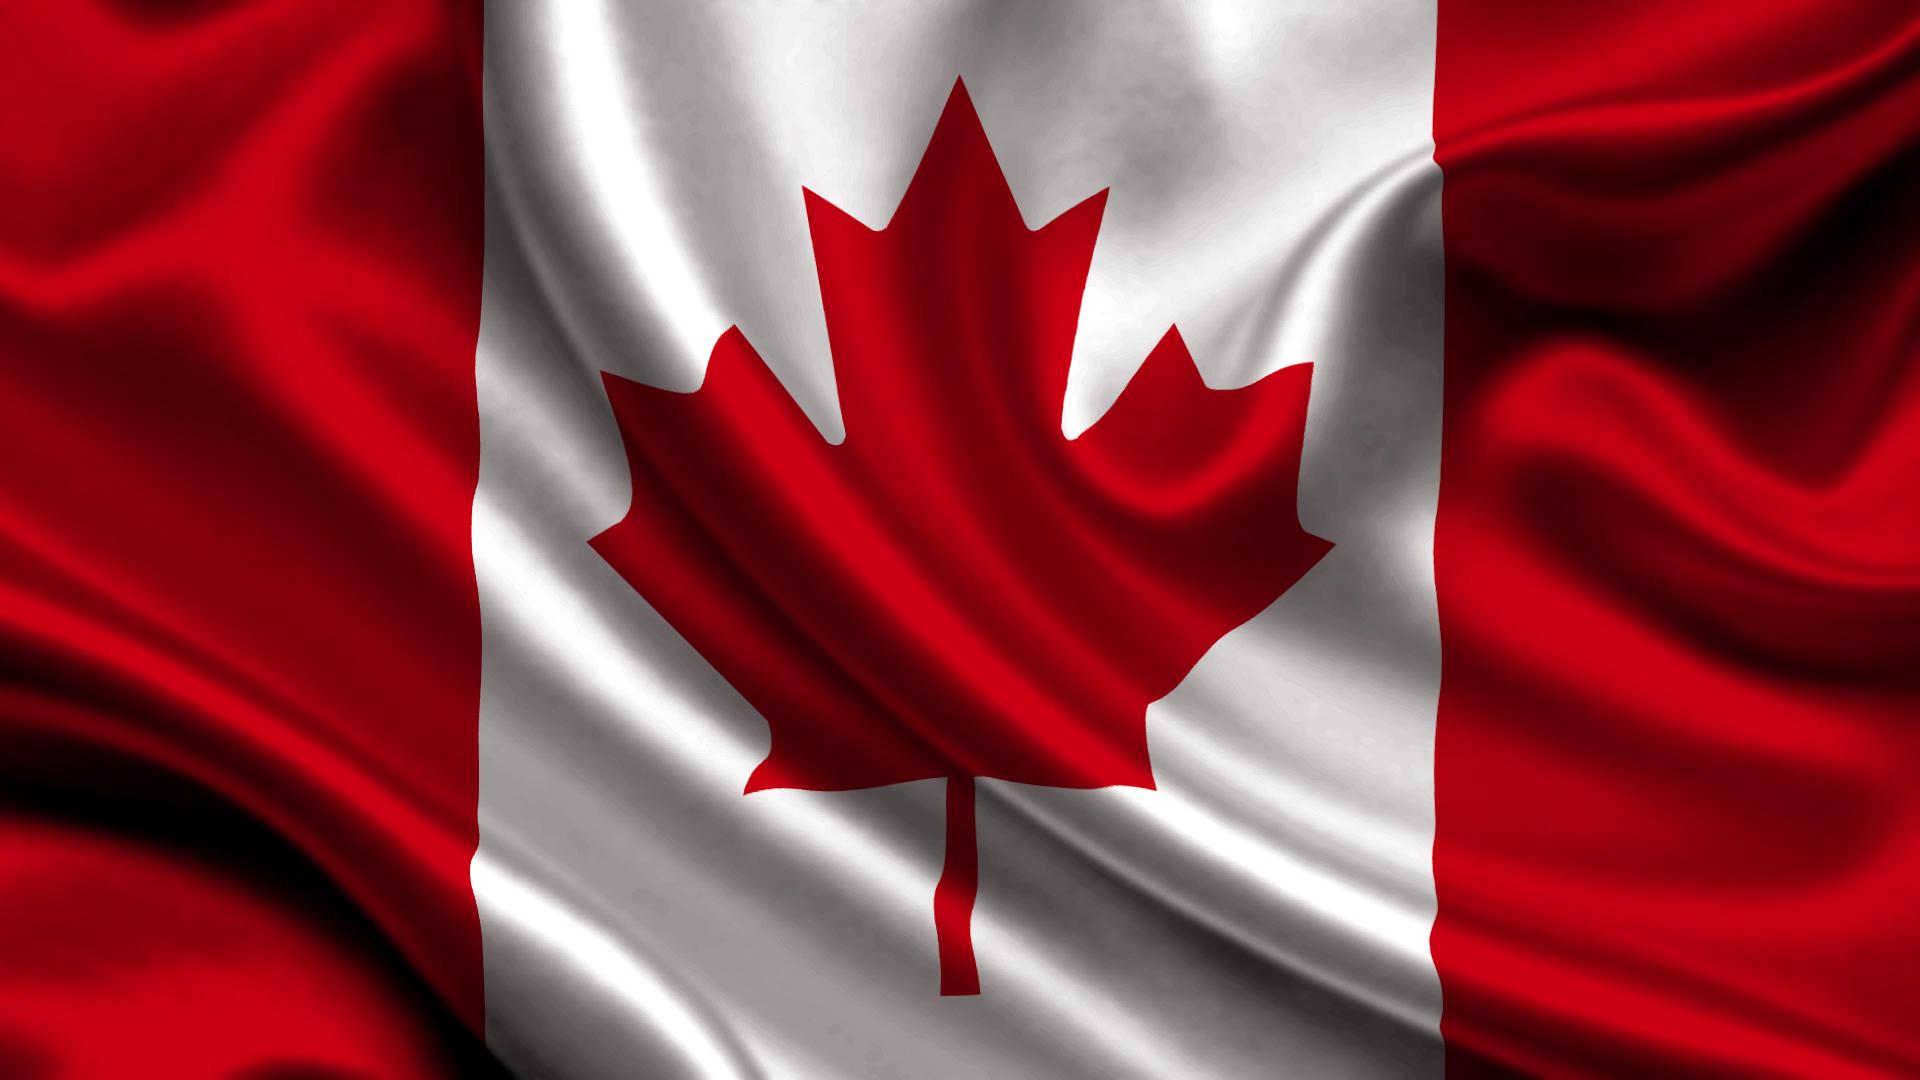 Canada flag emoji country flags.